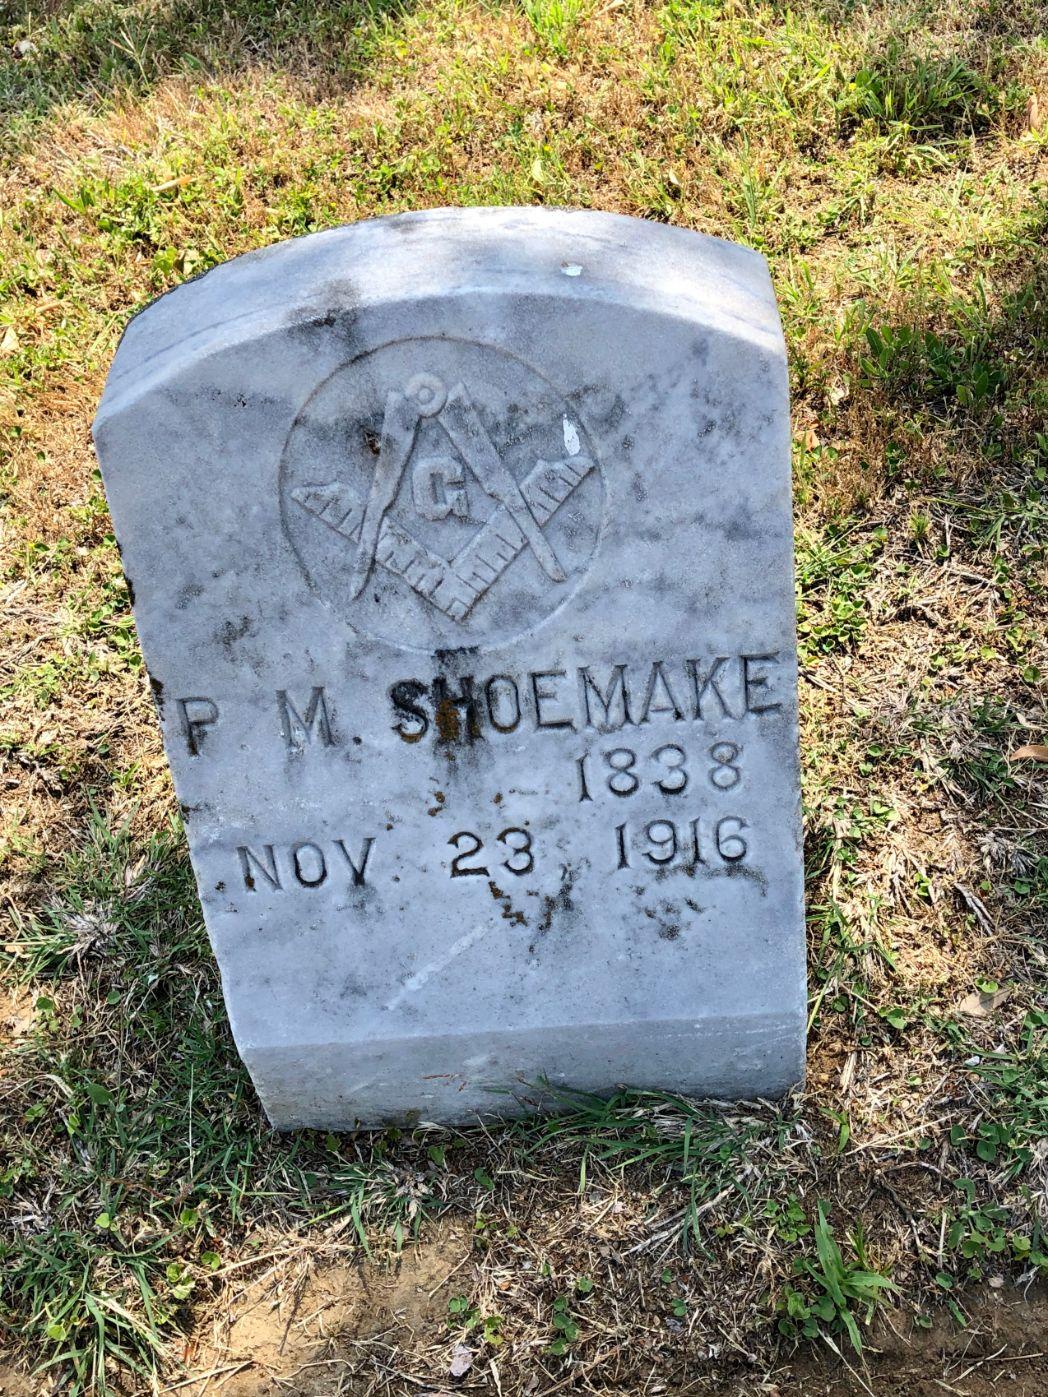 Shoemake